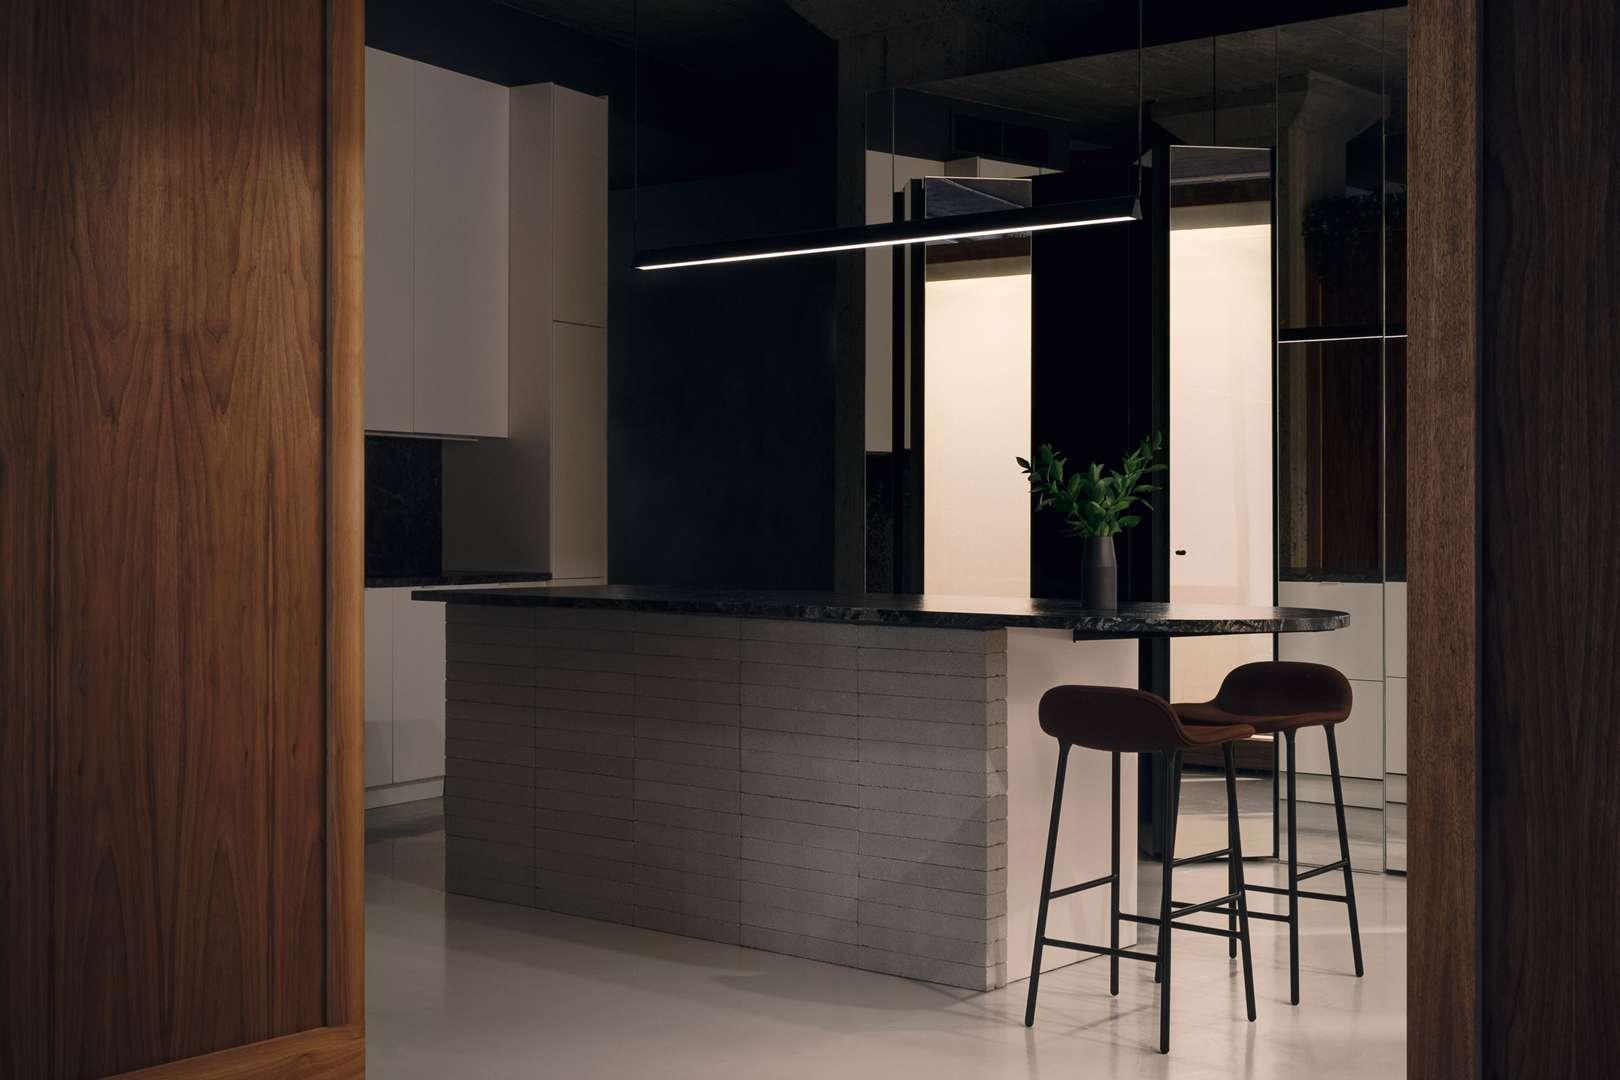 montreal-loft-renovation-by-future-simple-studio-interiors-canada_dezeen_2364_col_20